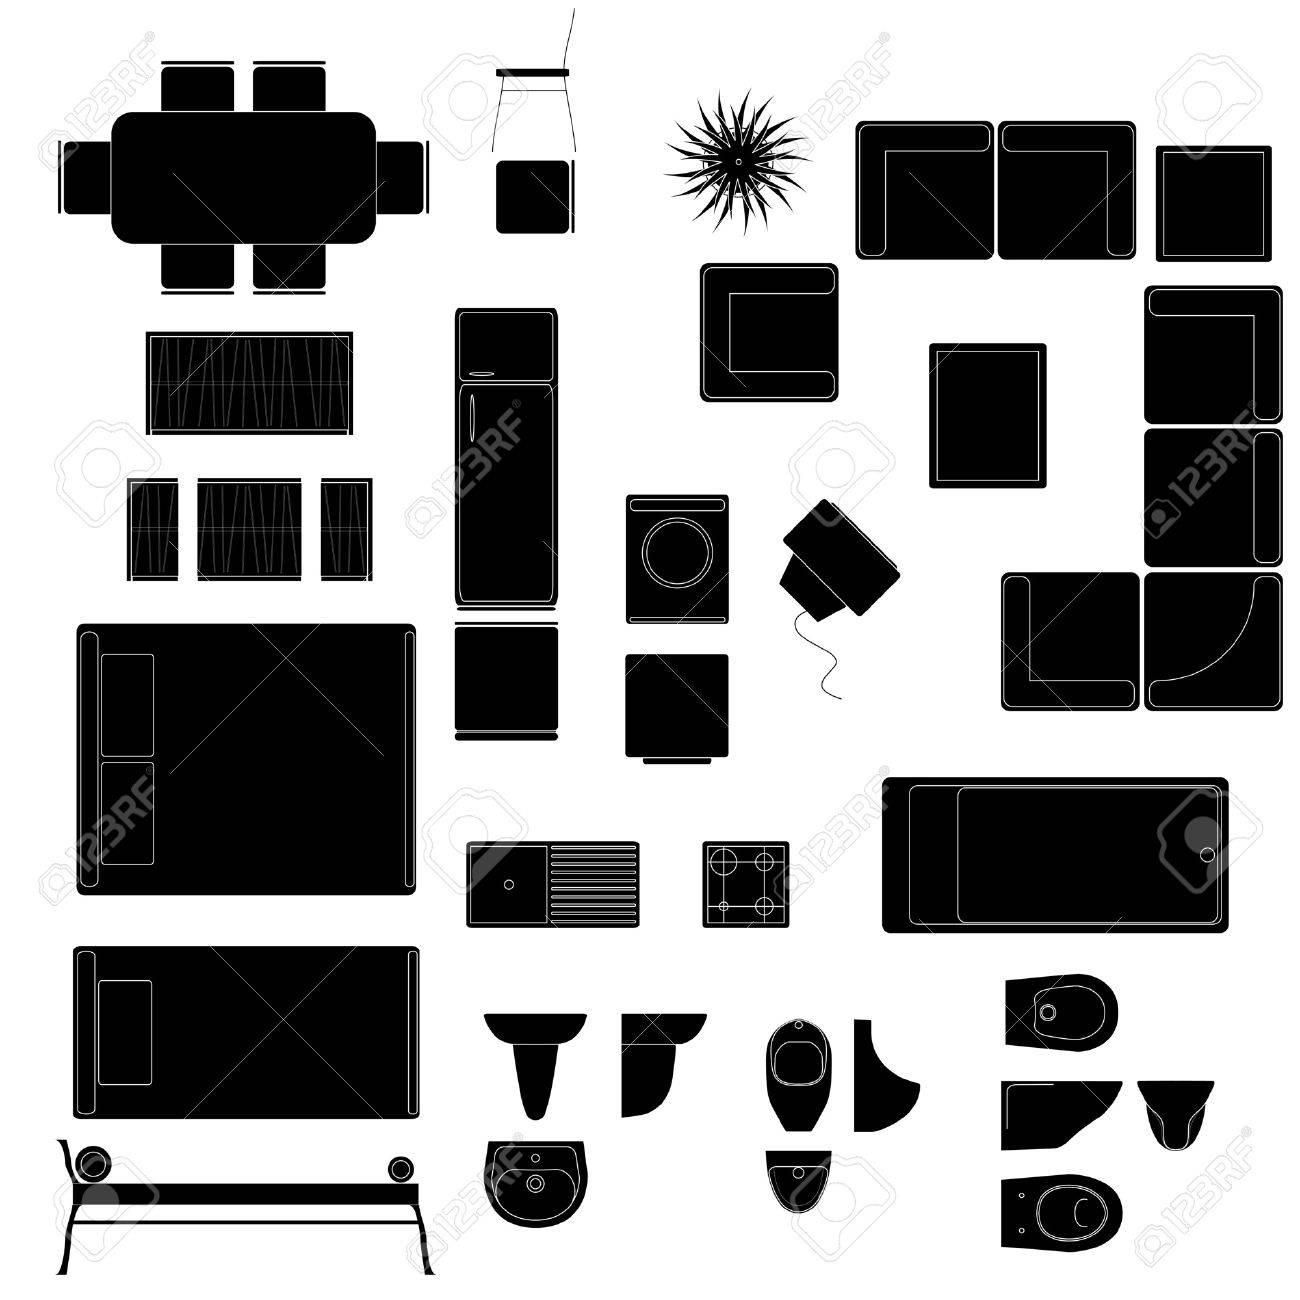 Single bedroom top view - Single Bed Top View Vector House Vector Design Elements